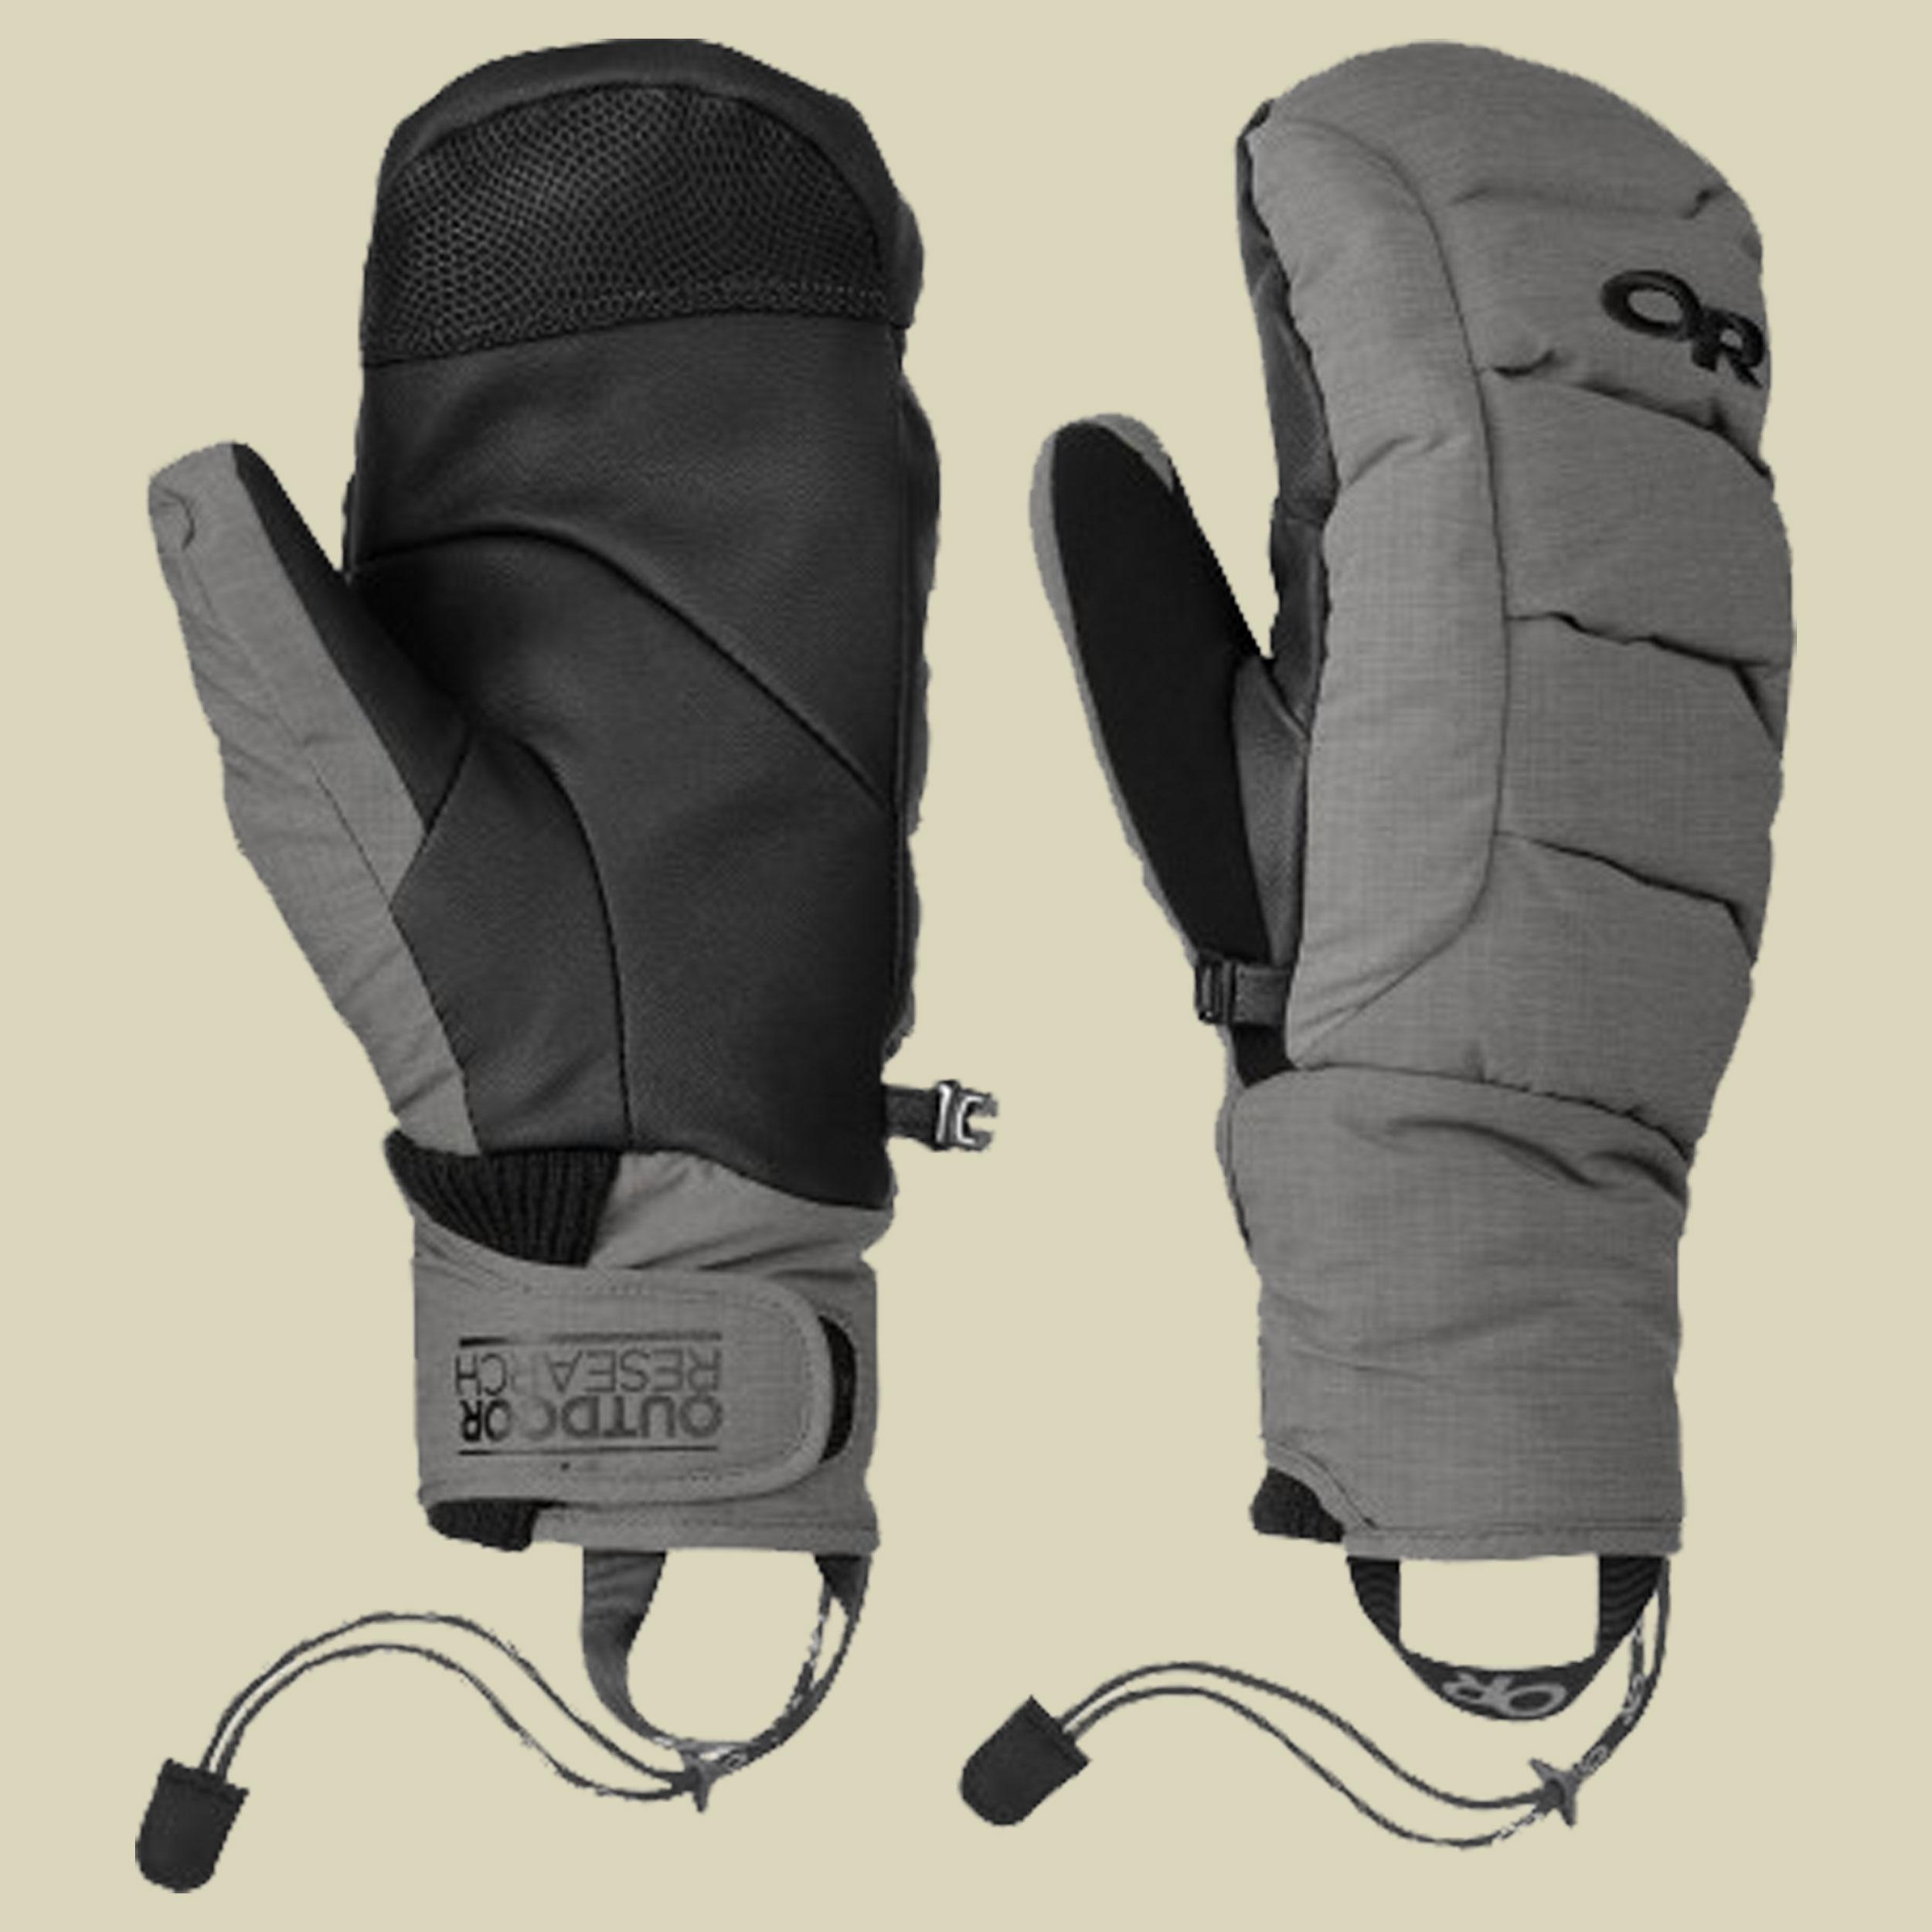 Roeckl Kabru Mitten GTX Unisex Handschuh Camping & Outdoor Handschuhe